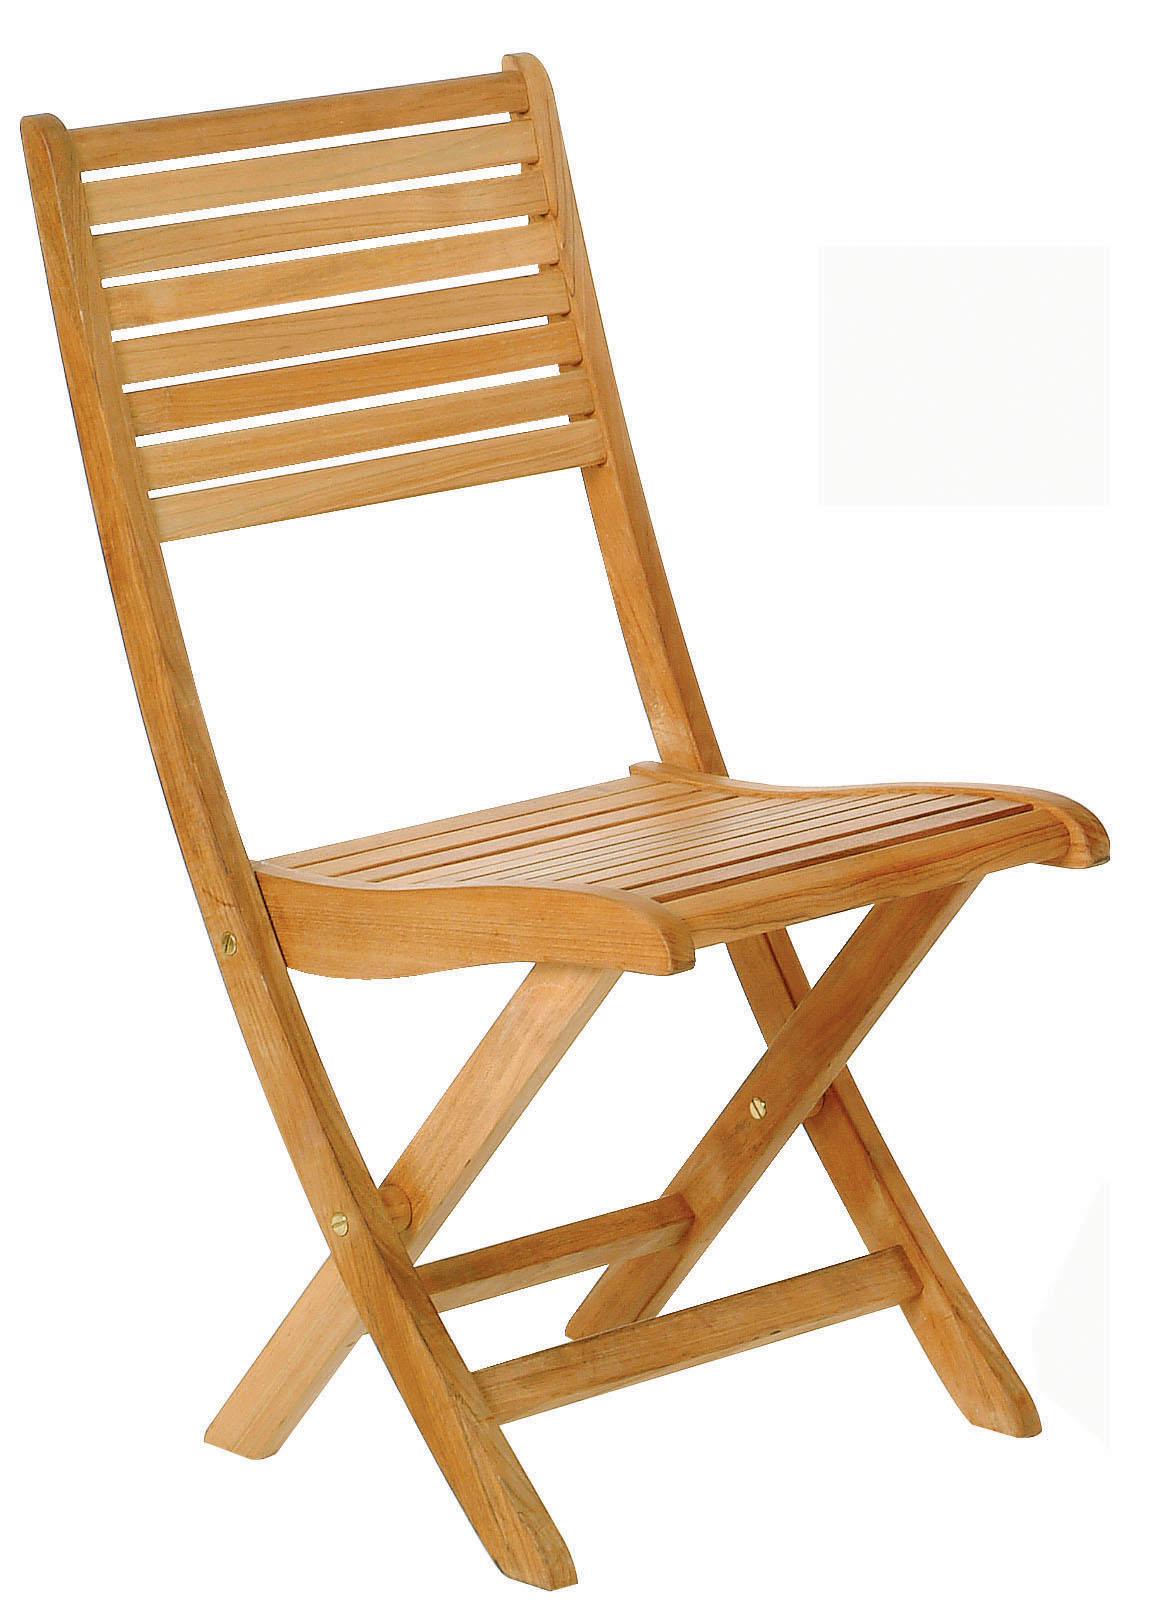 teak folding chairs canada cobra portable picnic chair les jardins transocean frontporc